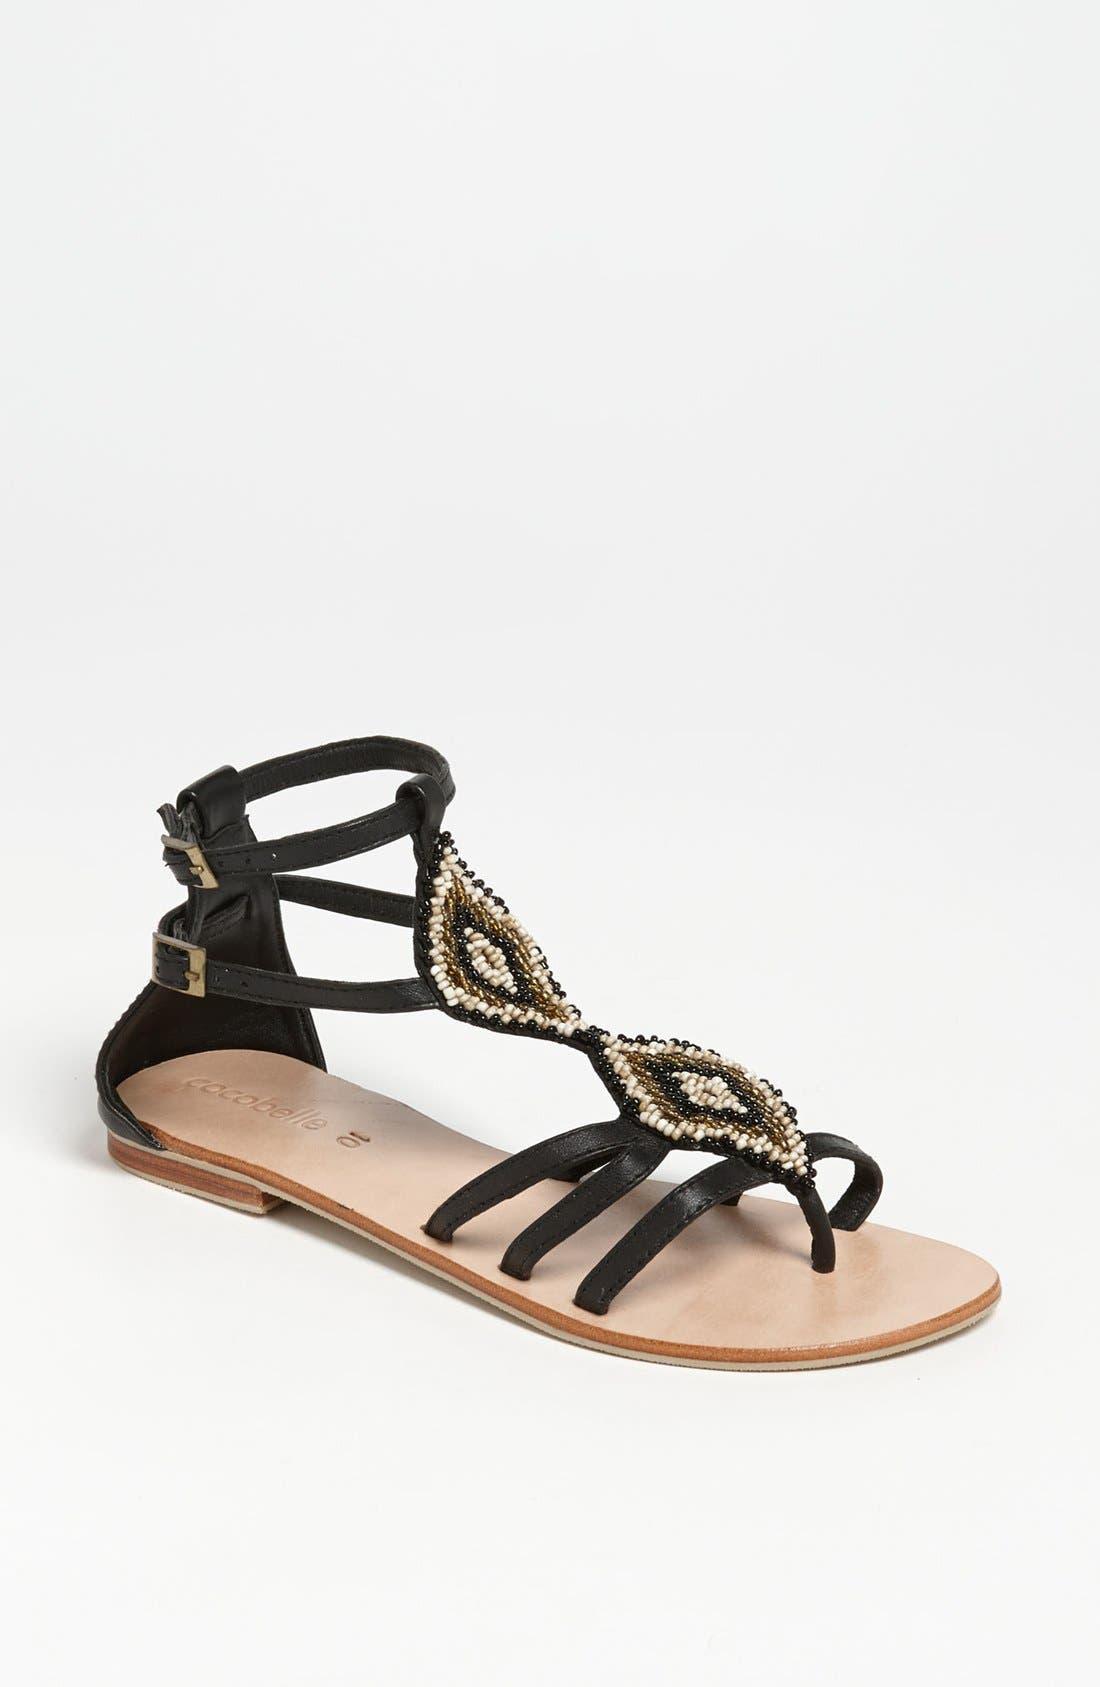 Alternate Image 1 Selected - Cocobelle 'Aztec' Sandal